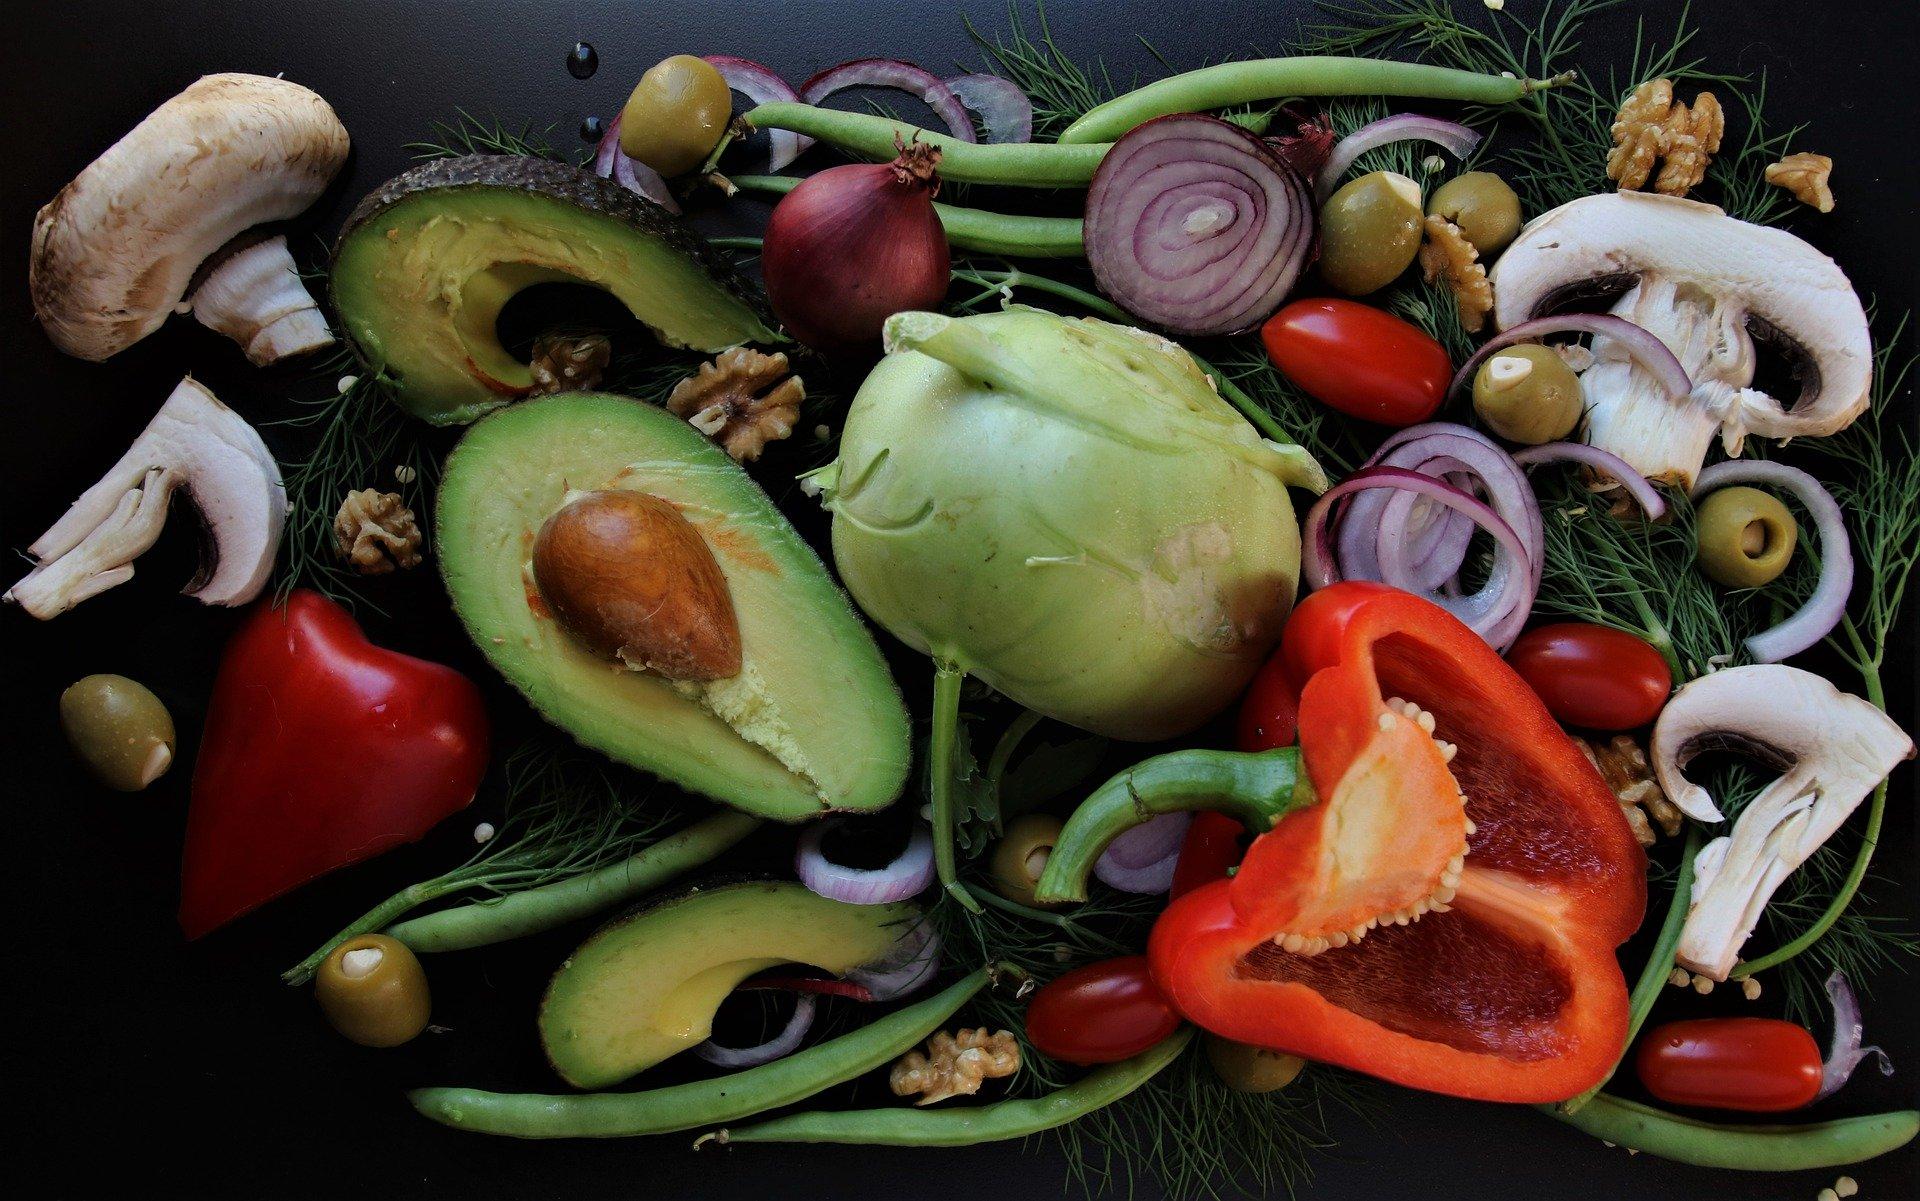 Ist vegane Ernährung gesund?